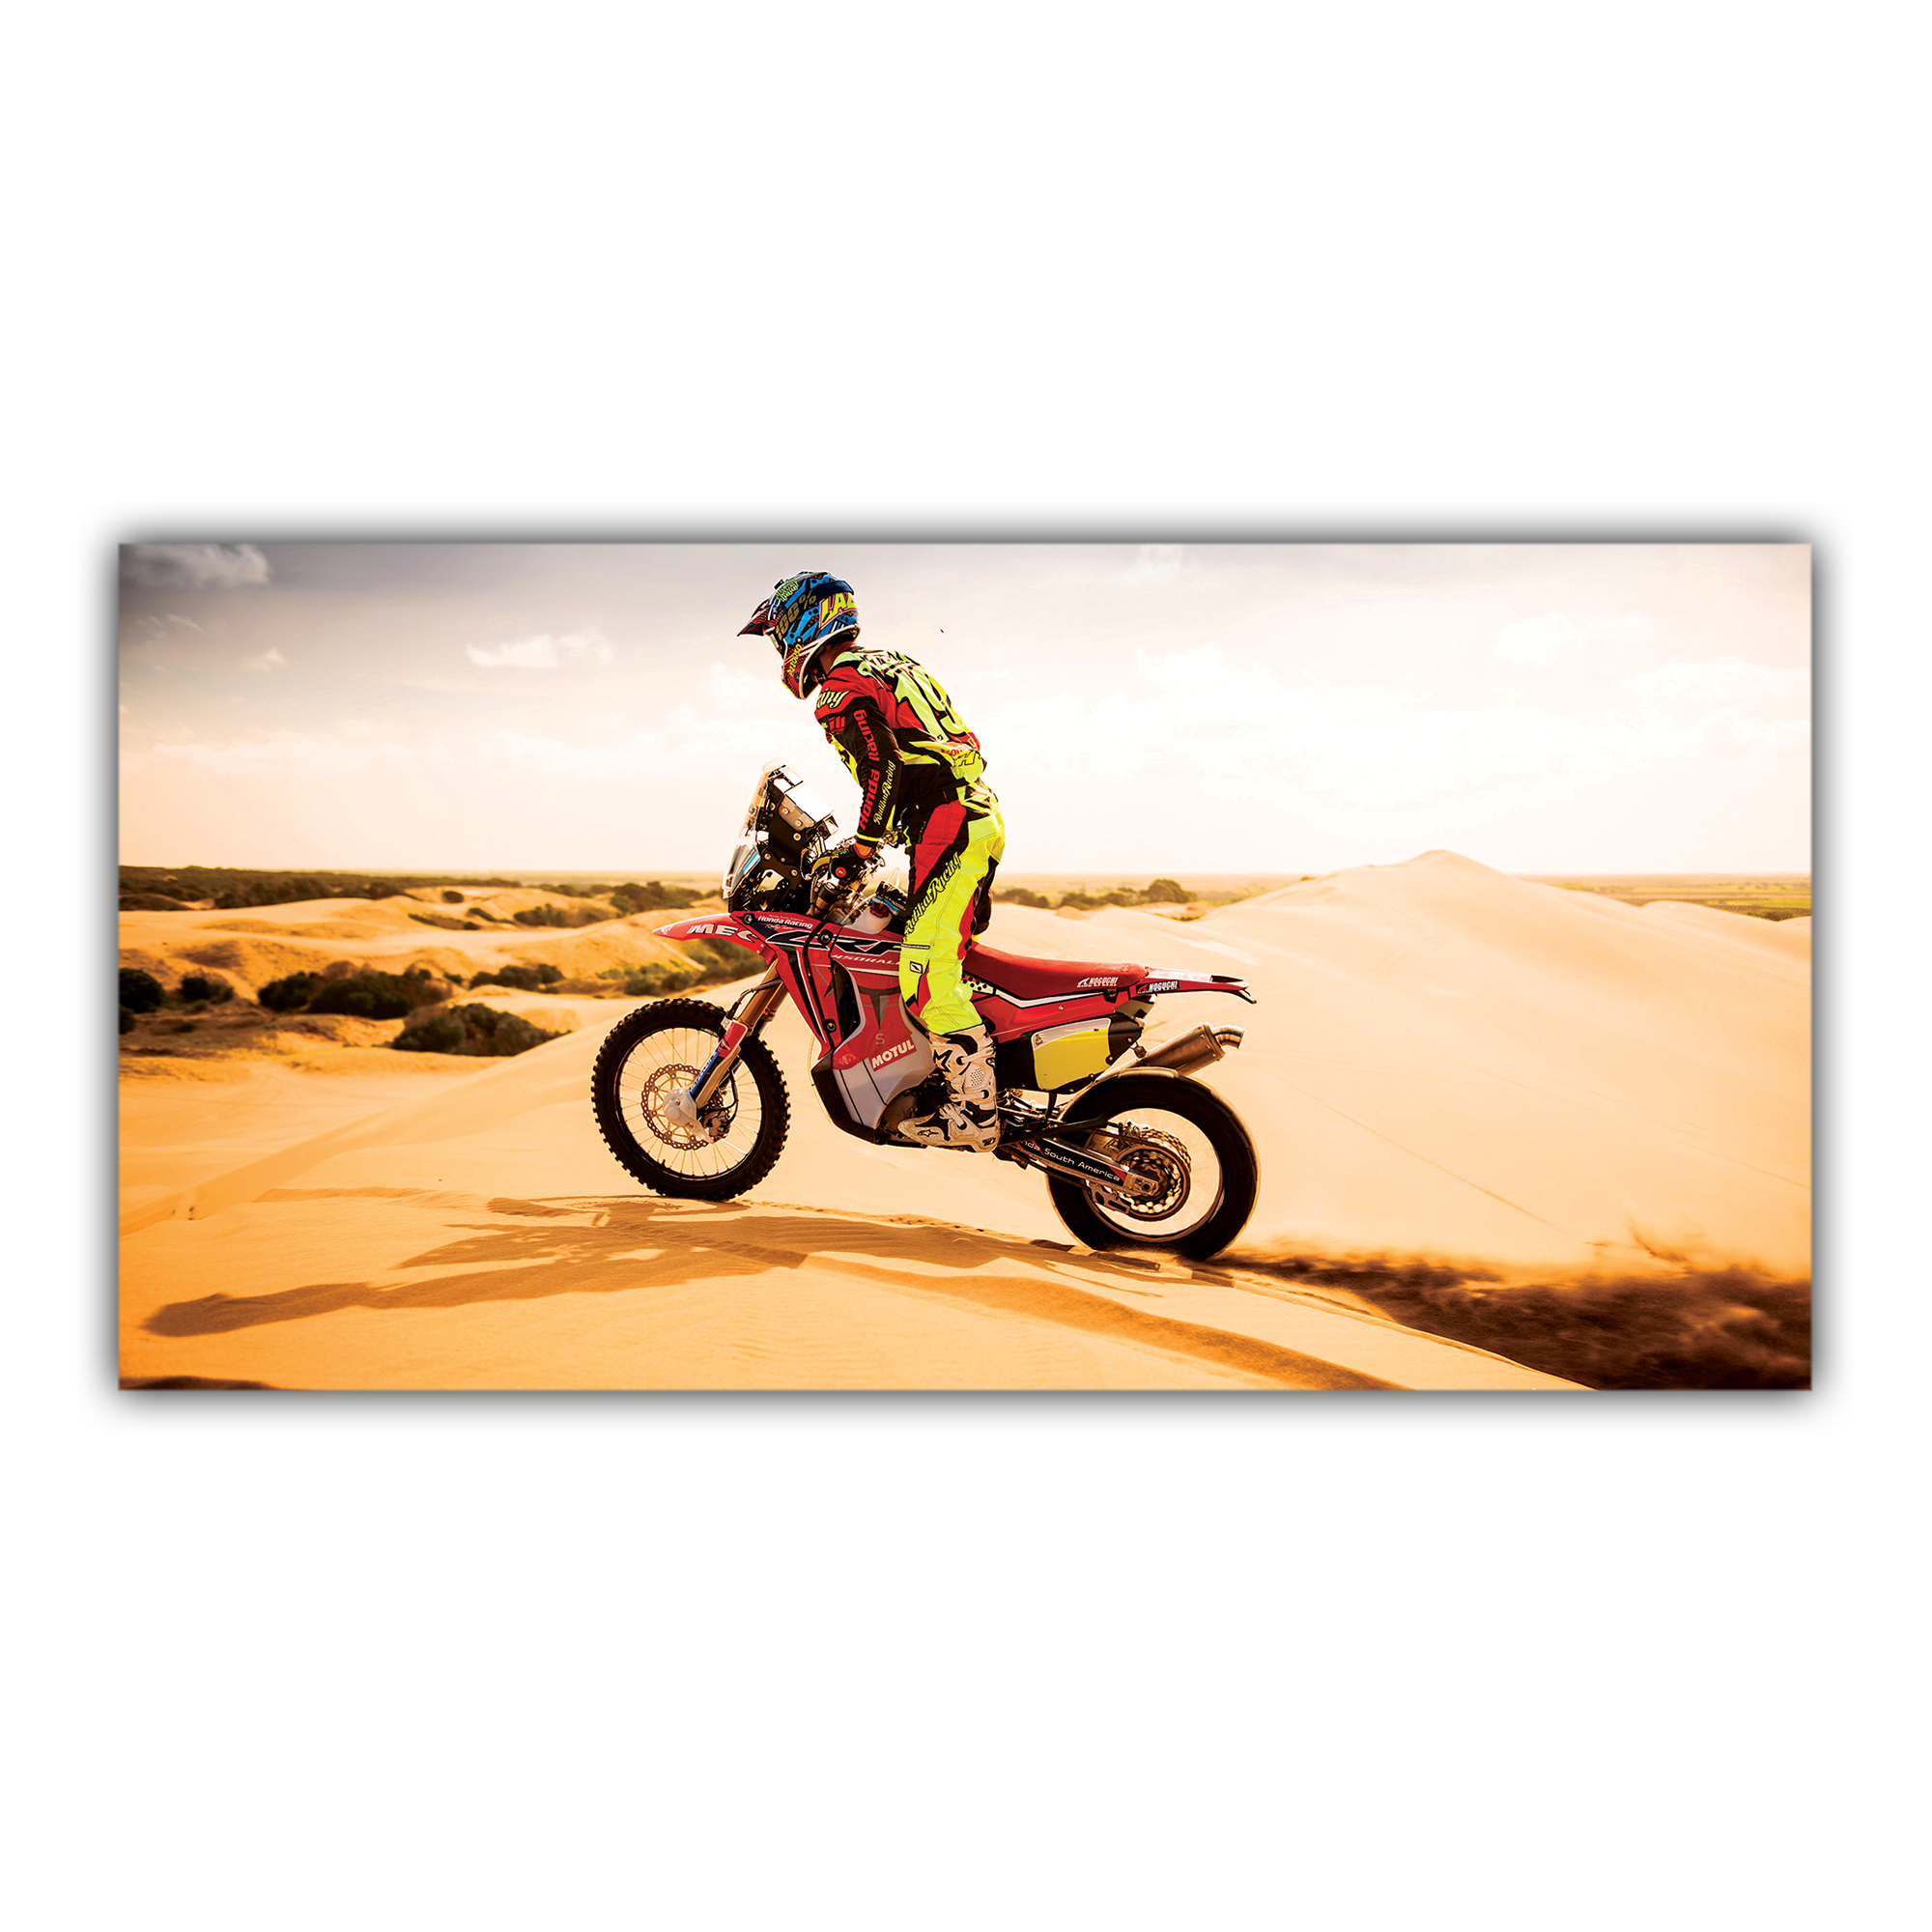 Moto Honda Dakar Enduro Désert